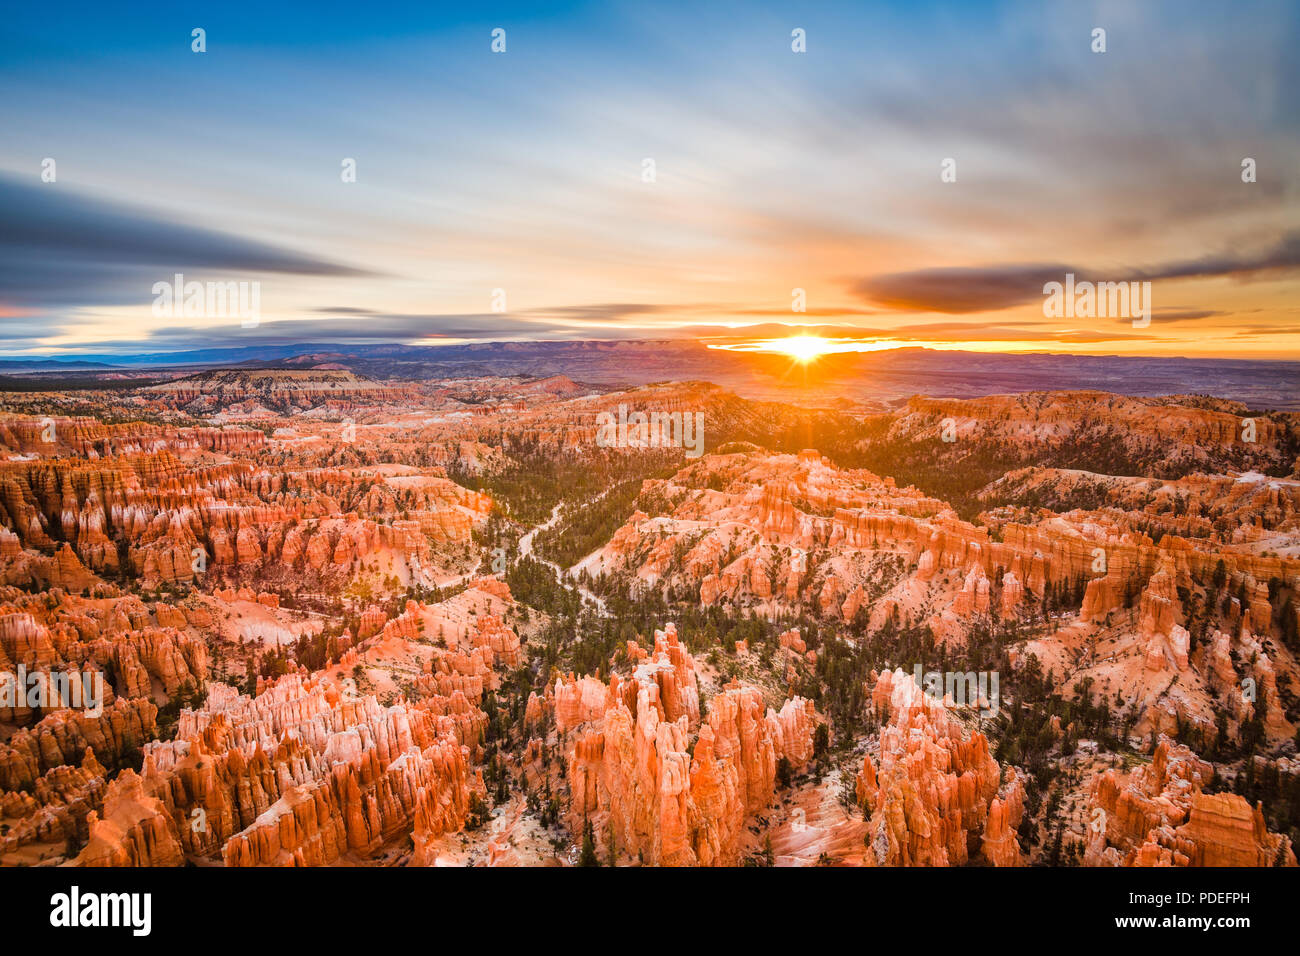 Bryce Canyon National Park, Utah, EE.UU. al amanecer. Imagen De Stock